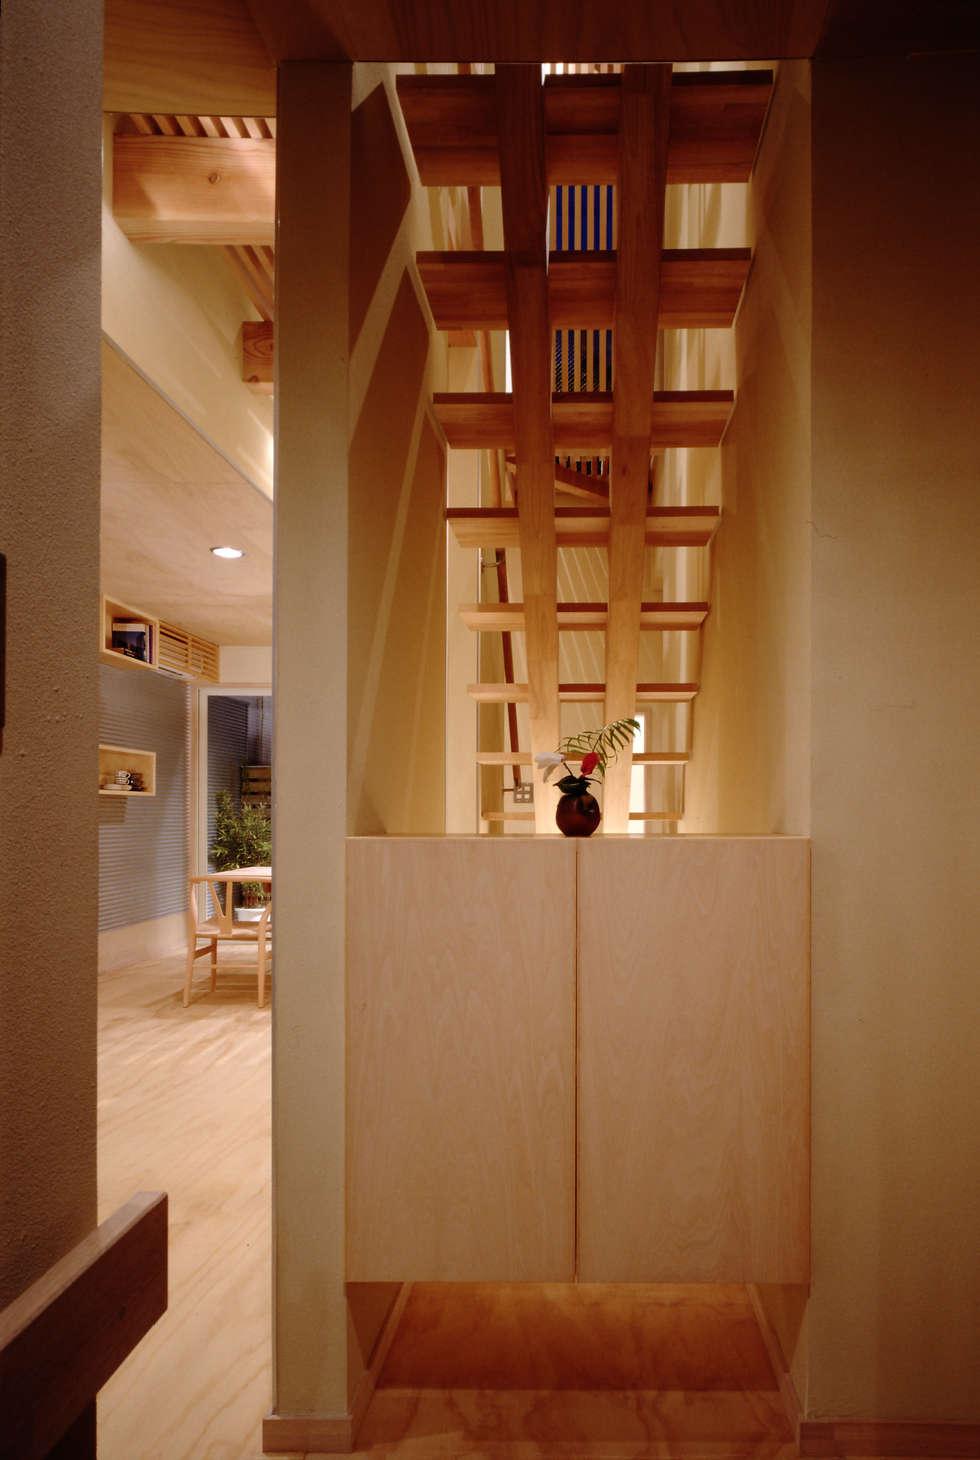 TAN エントランス: 濱嵜良実+株式会社 浜﨑工務店一級建築士事務所が手掛けた廊下 & 玄関です。